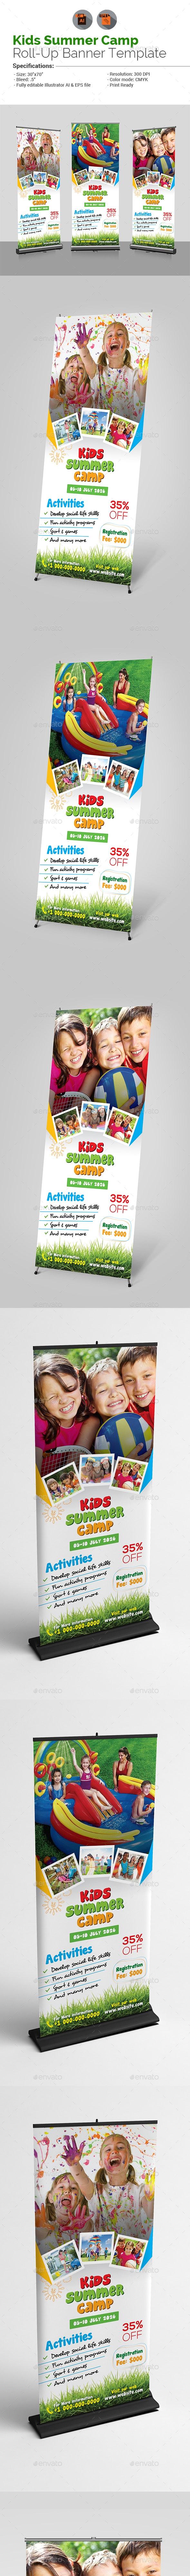 Kids Summer Camp Roll Up Banner - Signage Print Templates